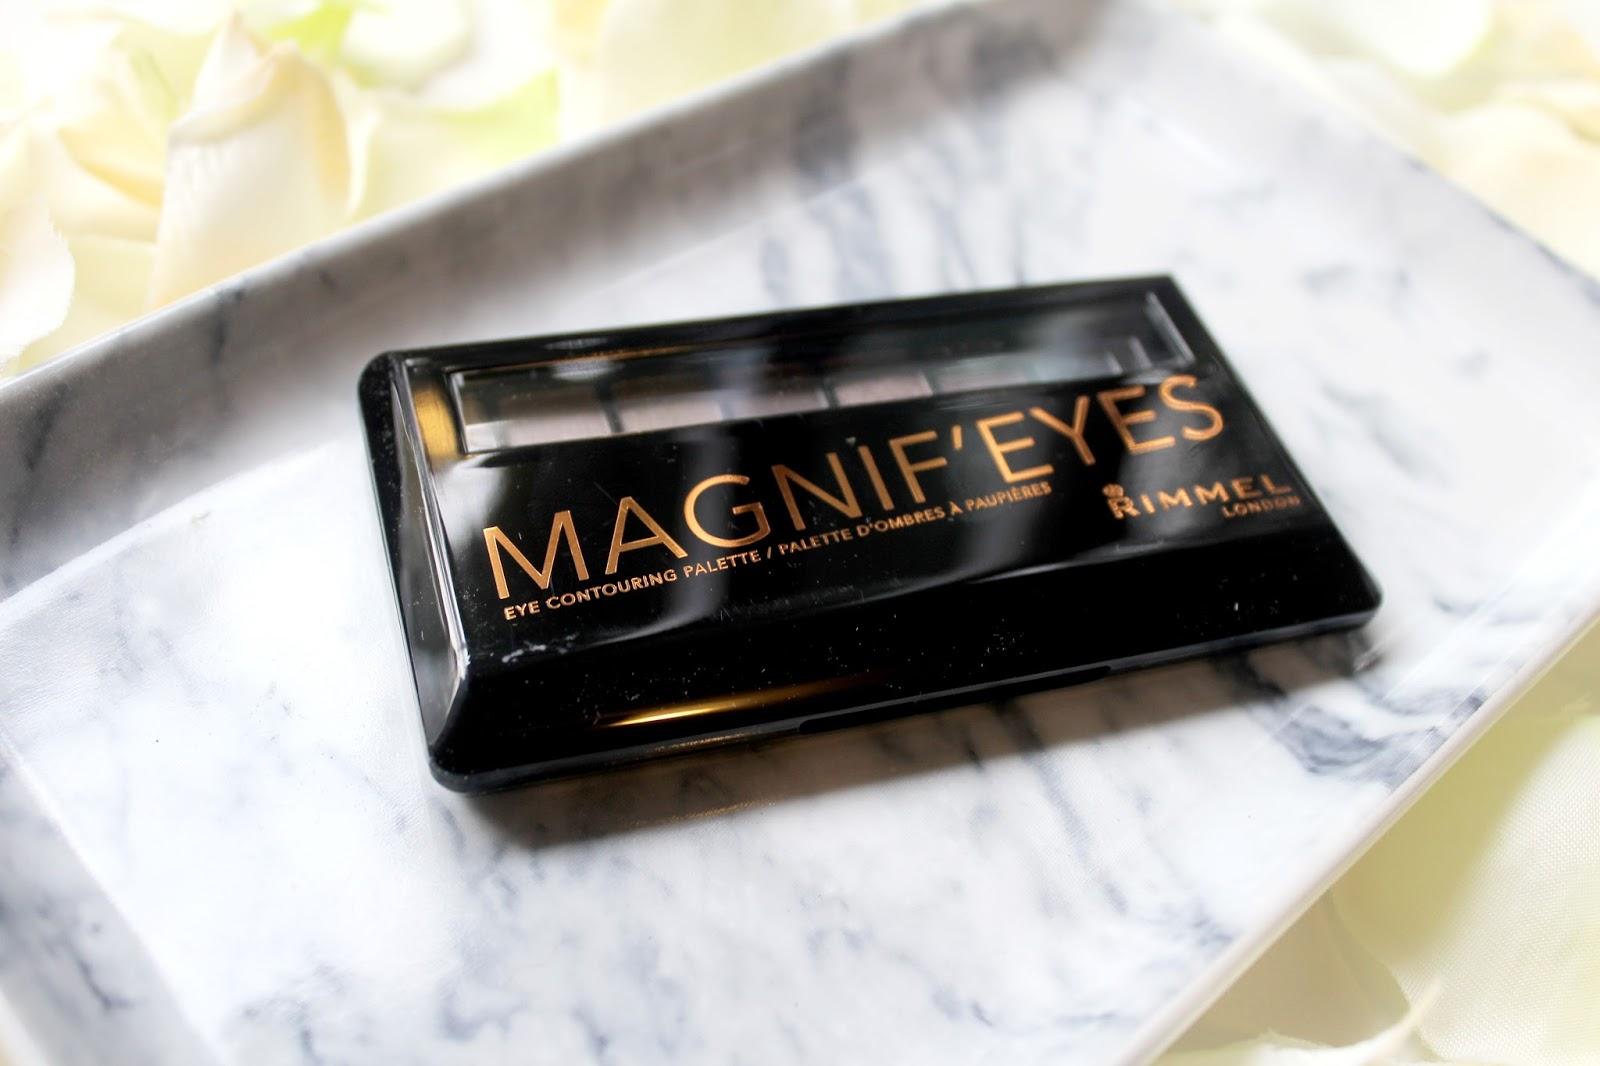 rimmel magnif eyes eye contouring palette review